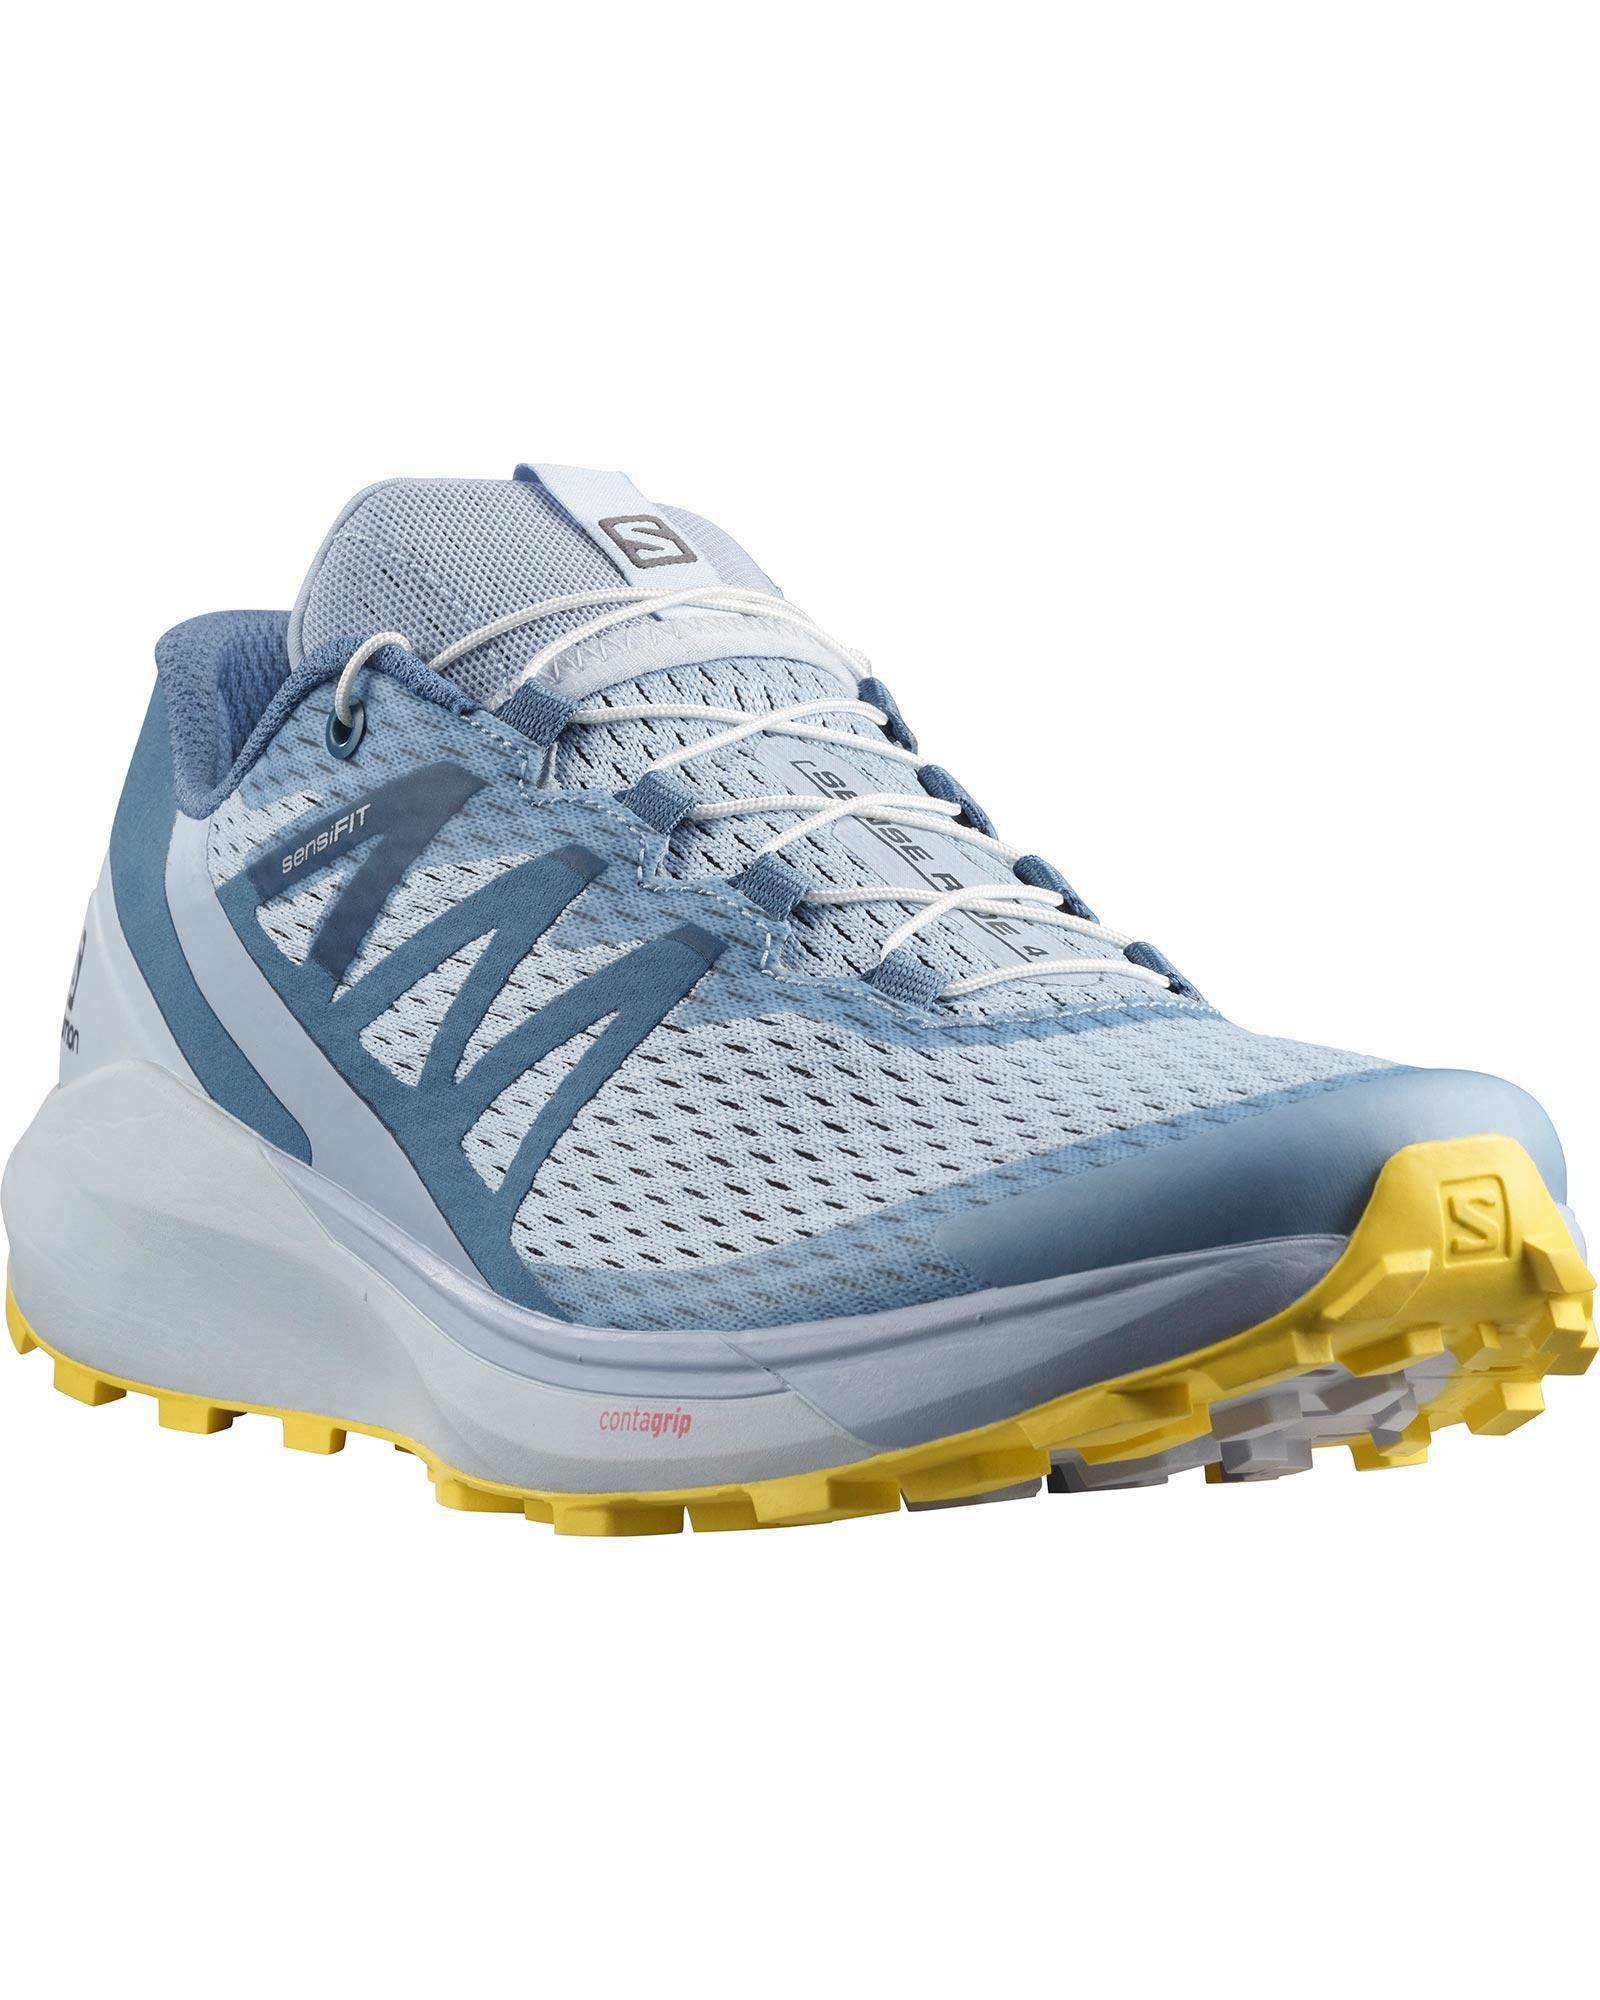 Salomon Women's Sense Ride 4 Trail Running Shoes 0